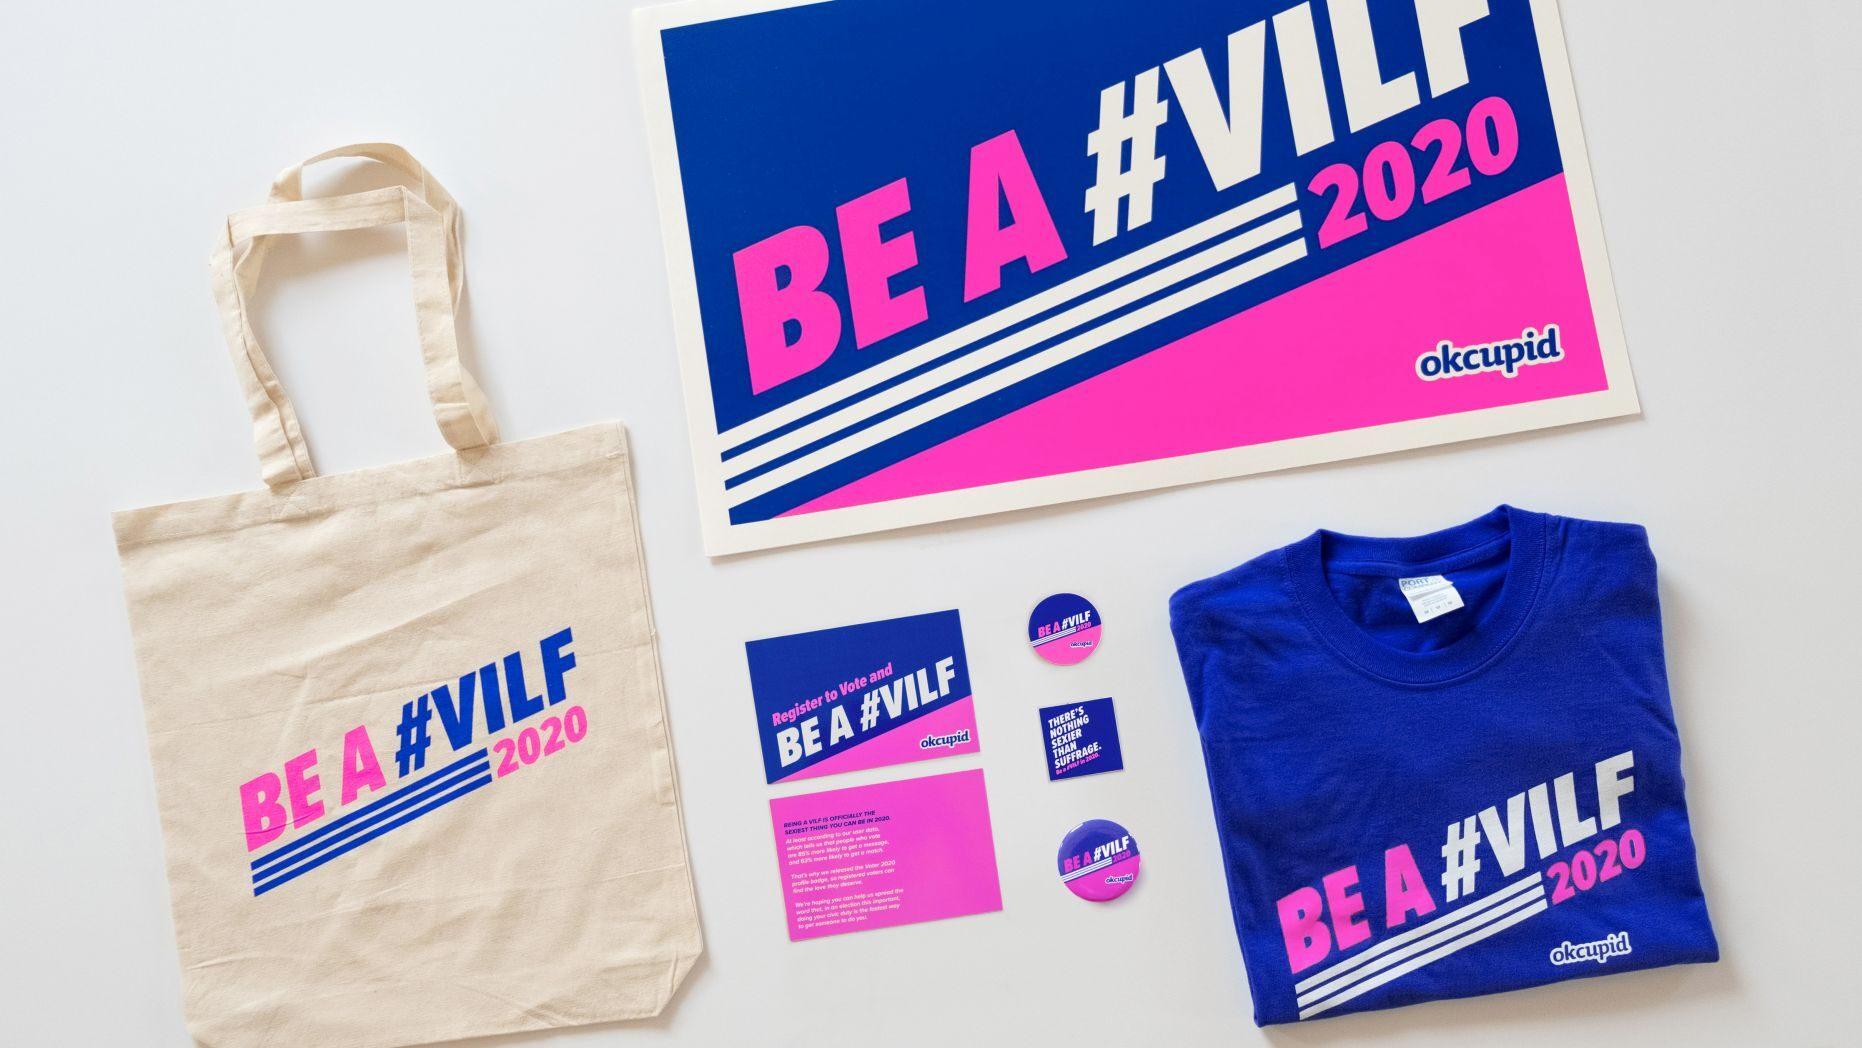 Risqué VILF Badge Promotes Voting Registrations on OkCupid